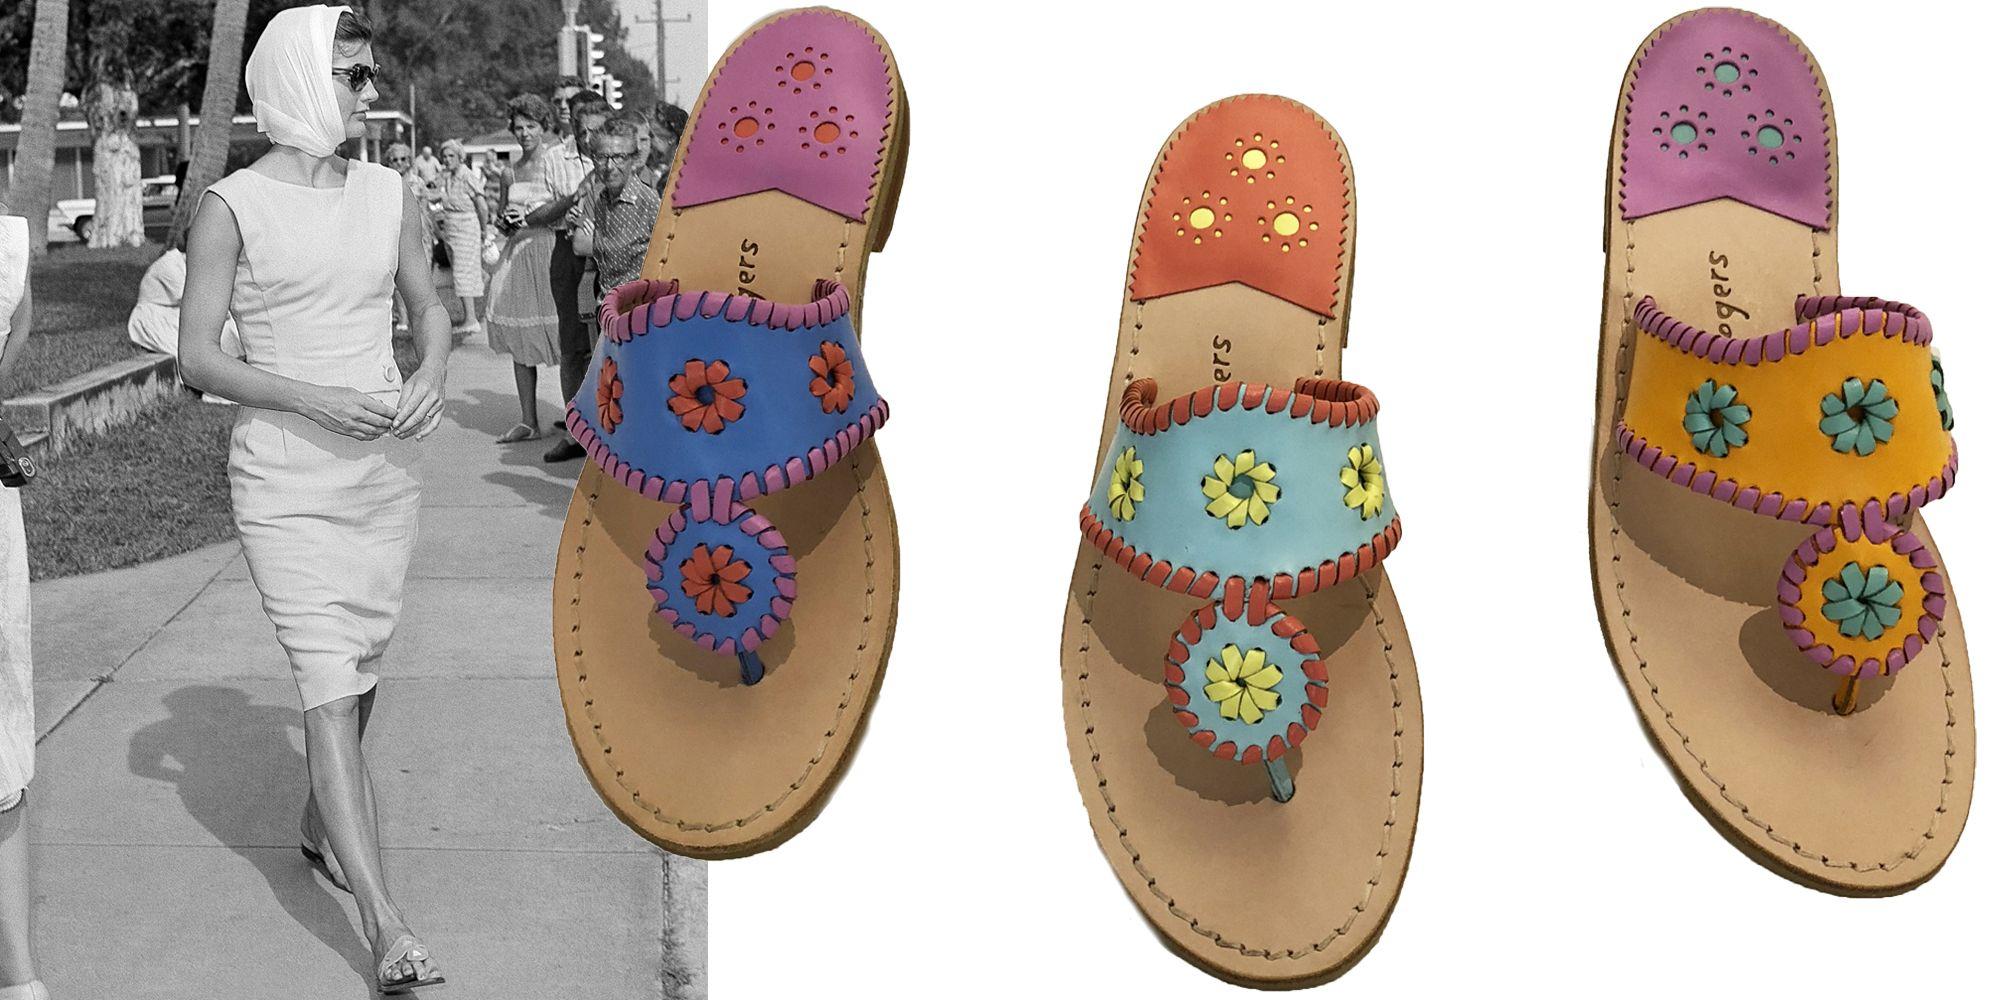 hbz-jackie-o-sandals-index1-1515601761.jpg (2000×1000)